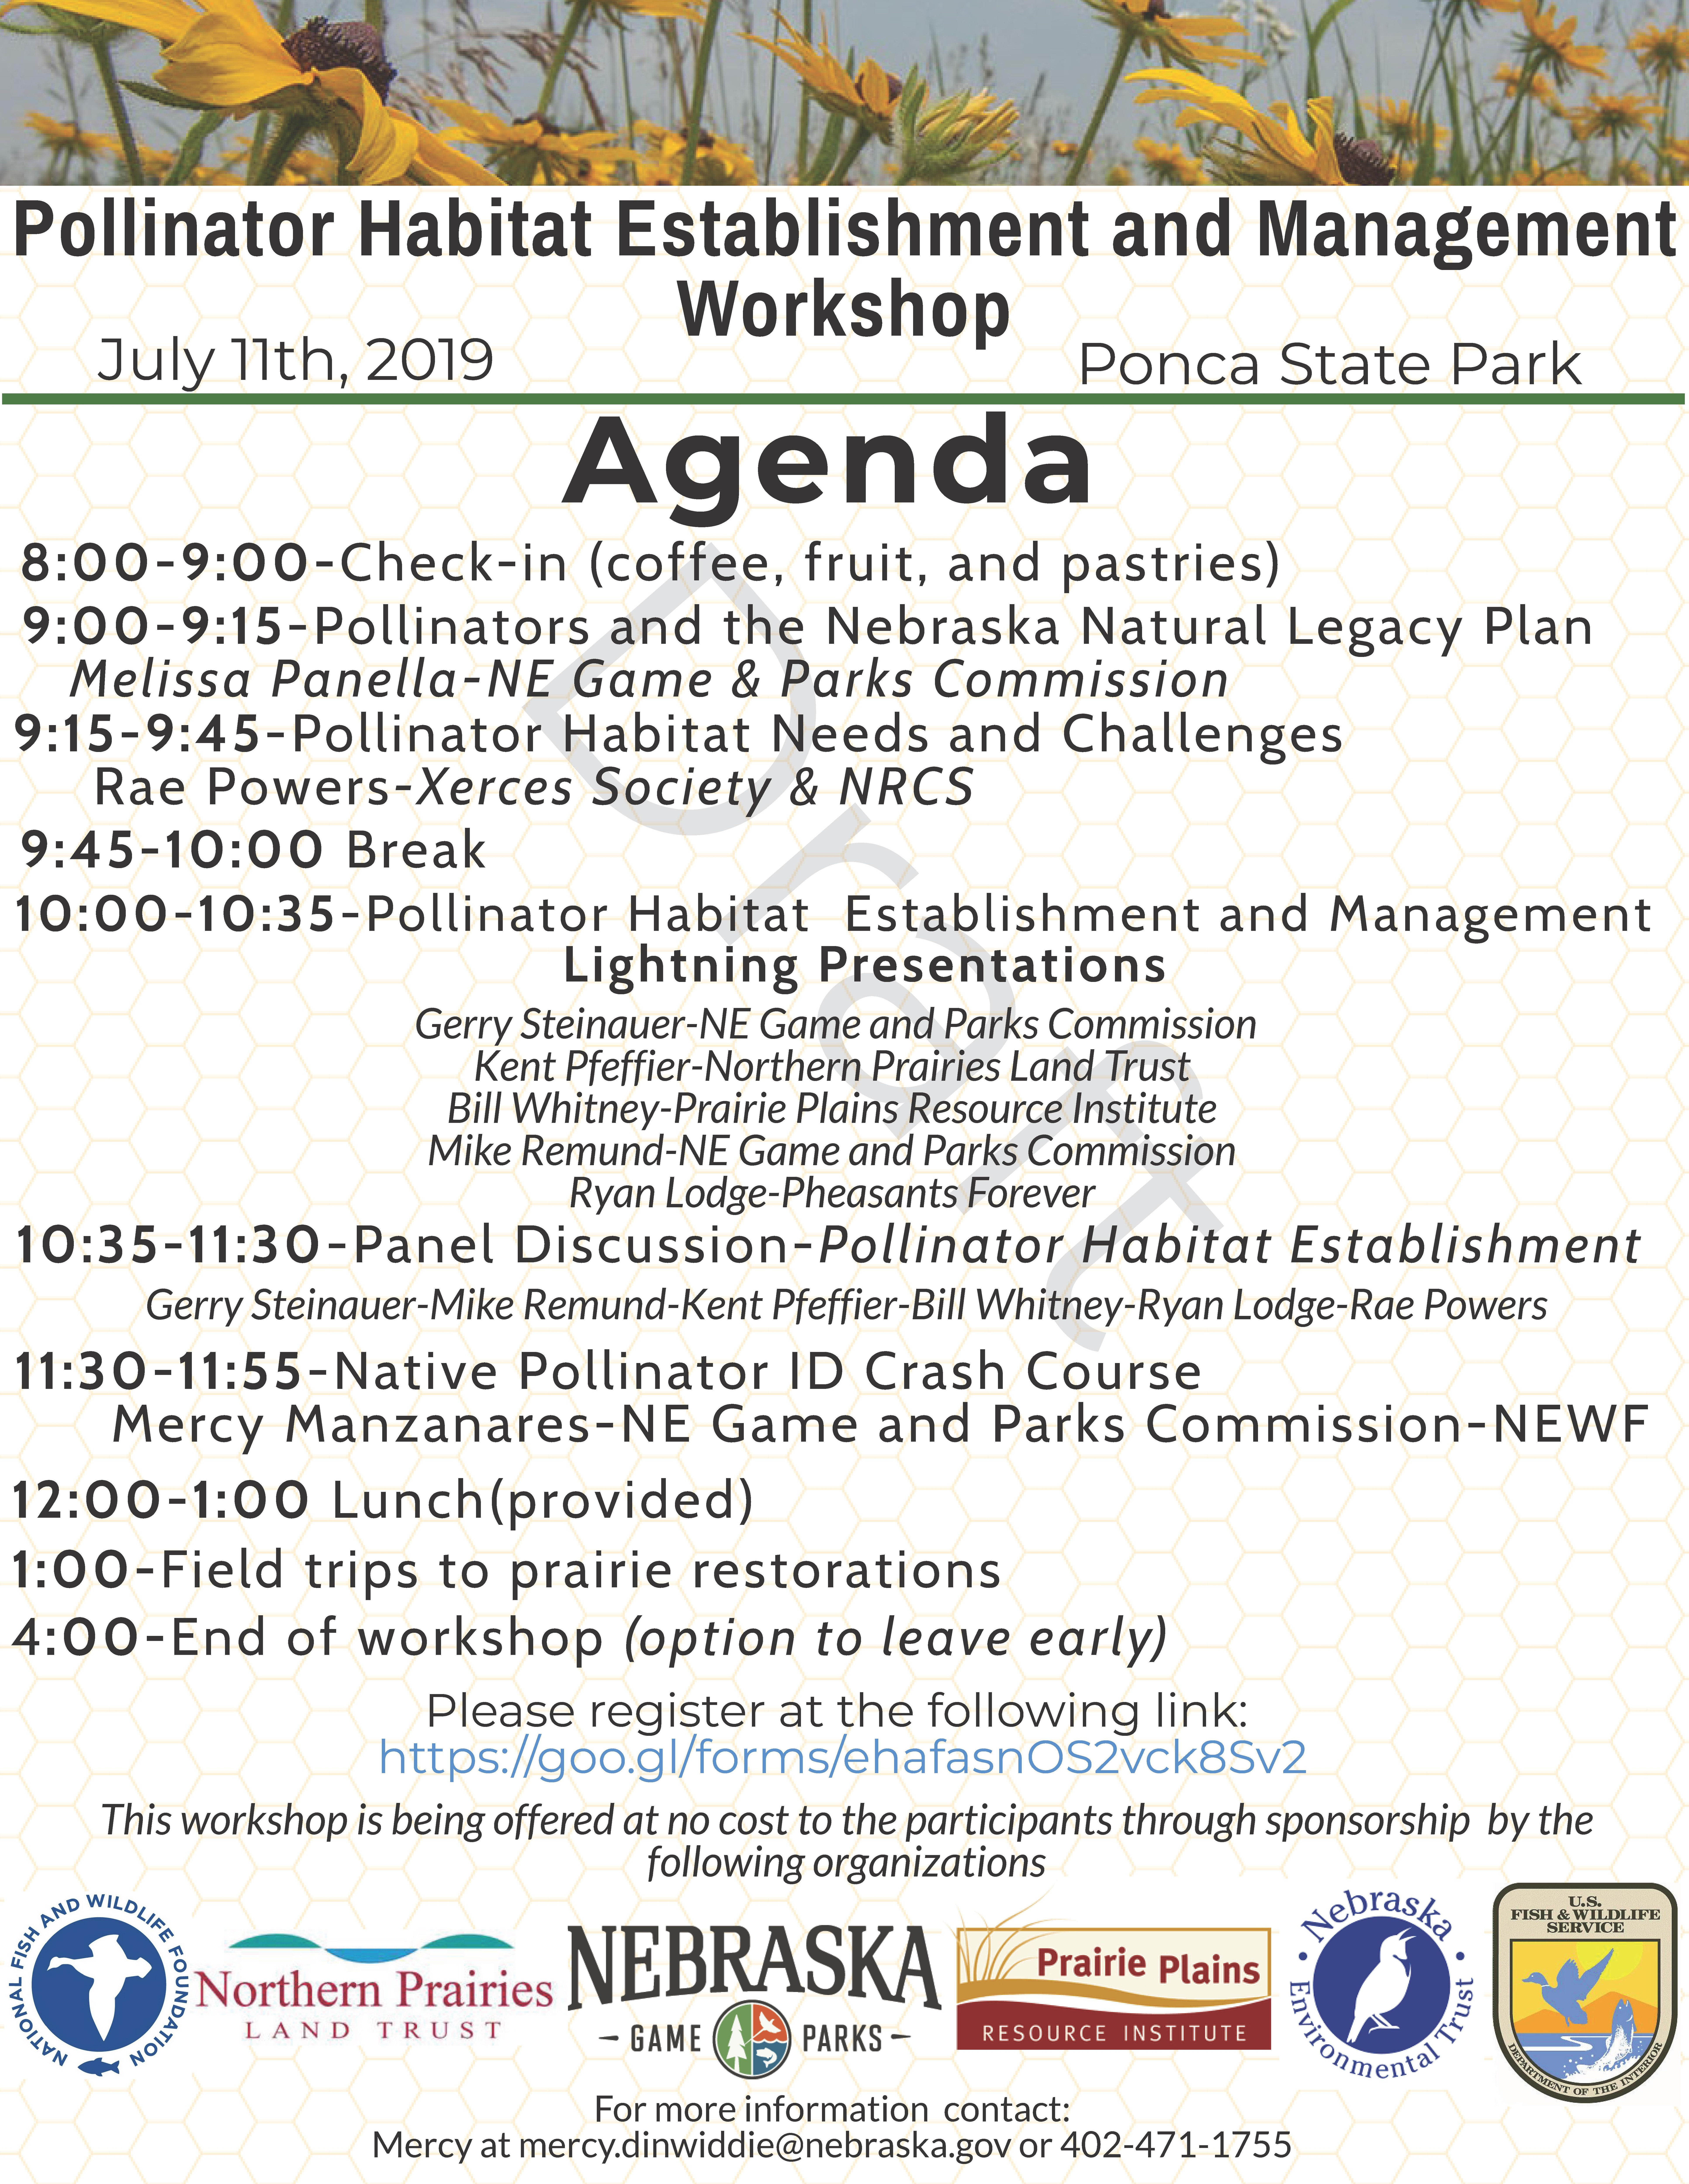 CE: Pollinator Habitat Establishment and Management Workshop